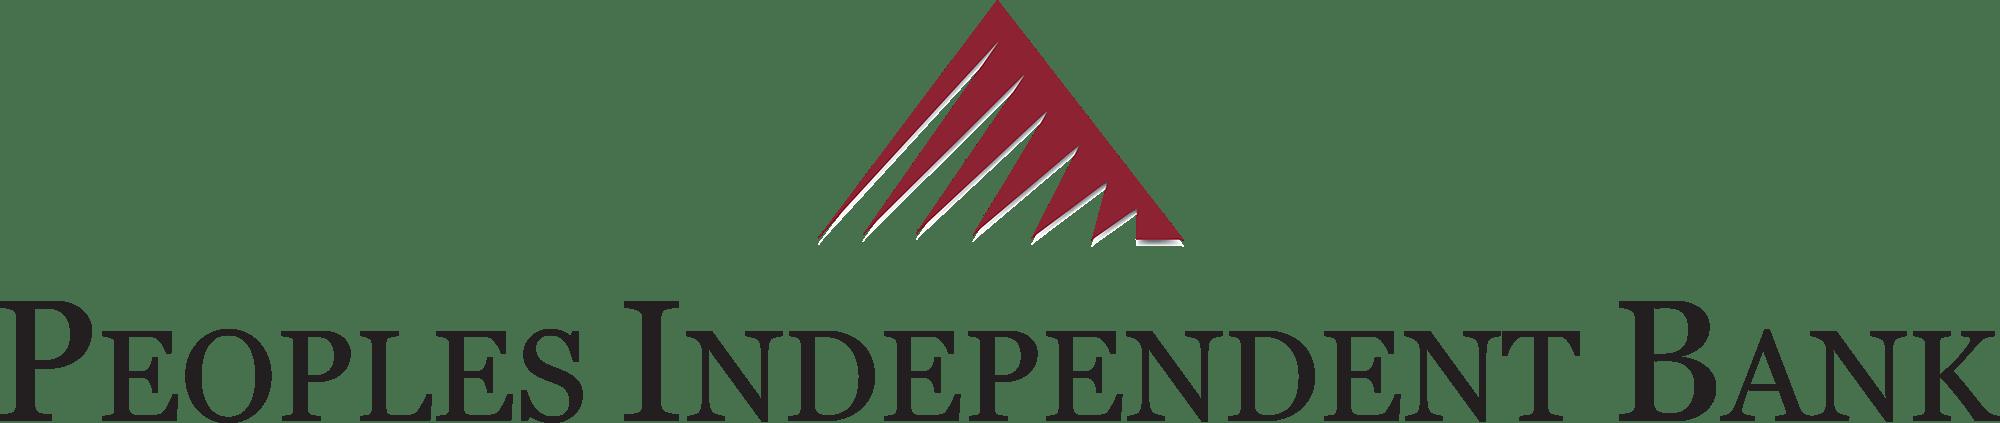 Peoples Independent Bank Online Banking